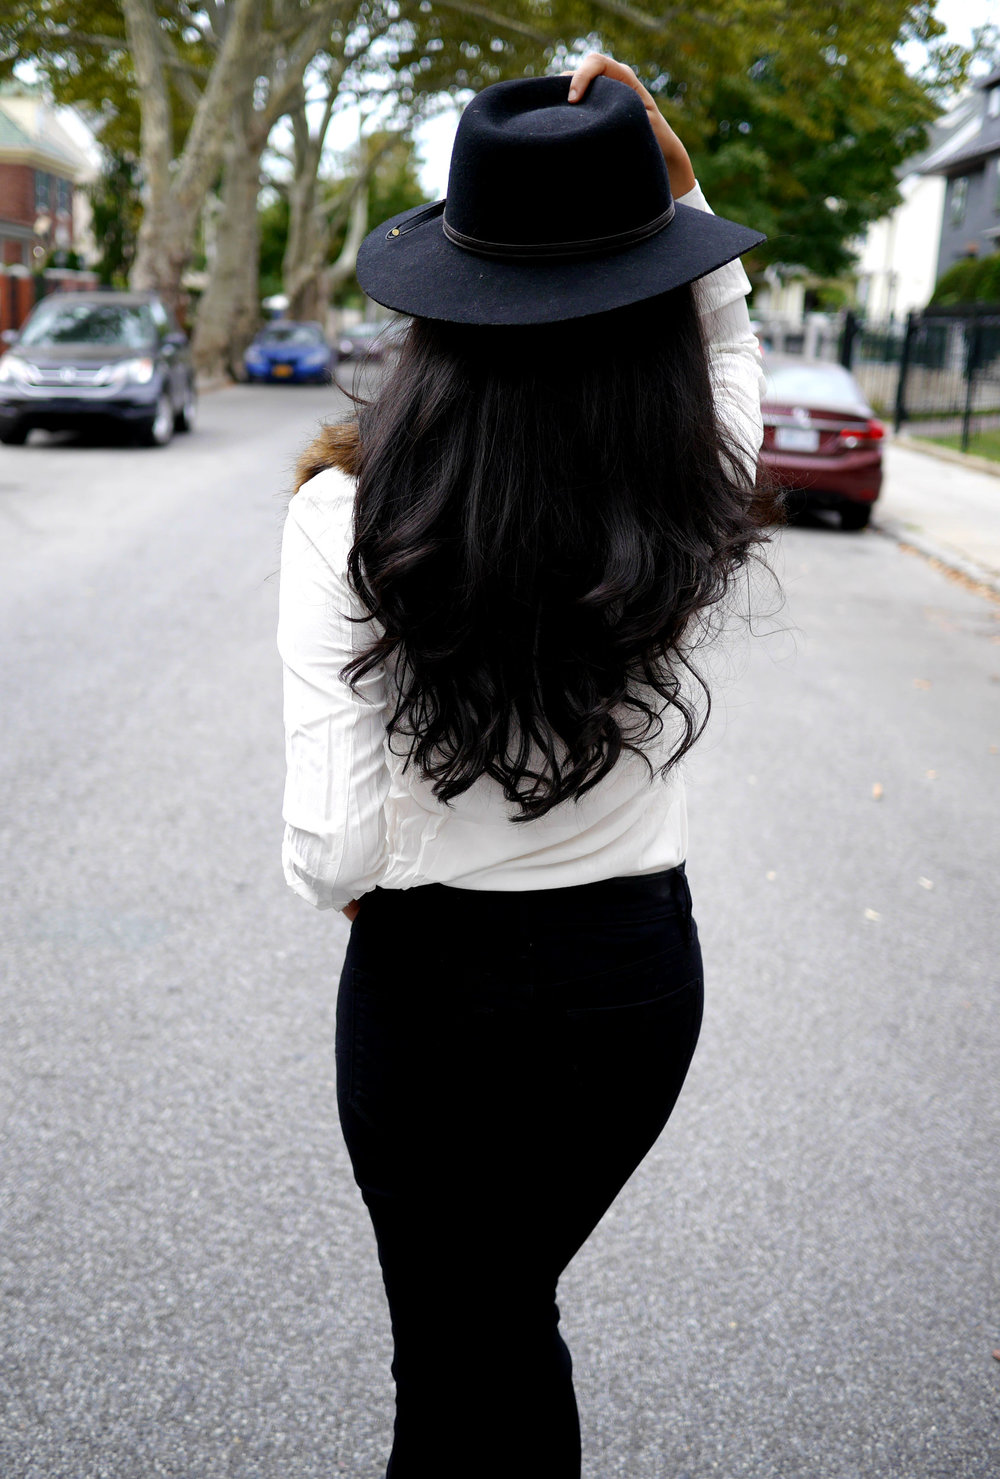 Everlane Silk Shirt Gucci Loafers LOFT Black Skinny Jeans